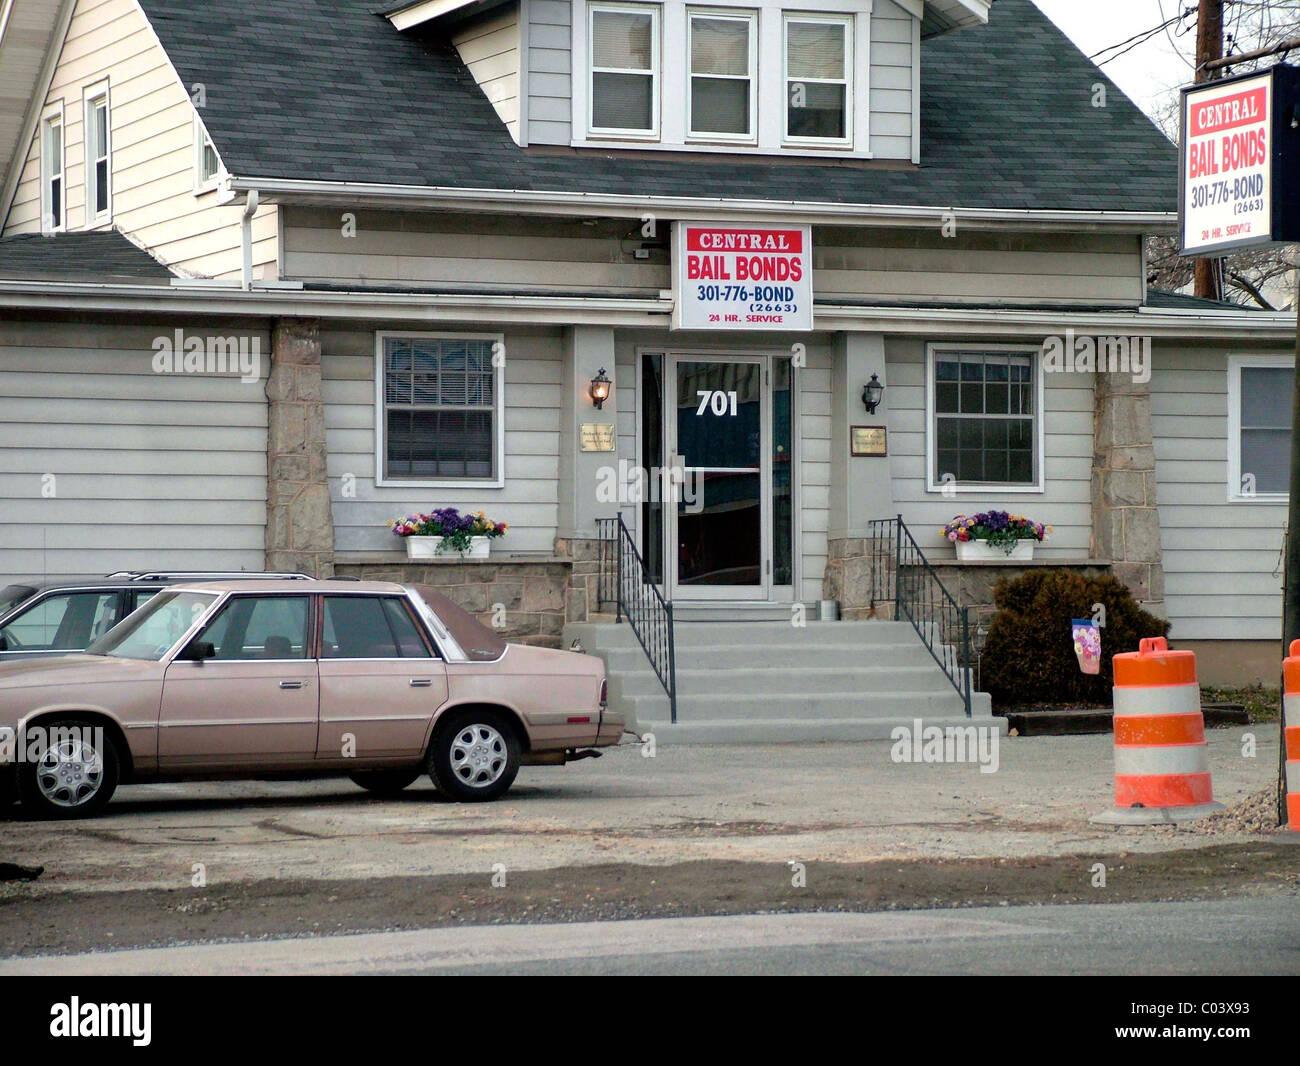 bail bondsman's office Laurel, md - Stock Image